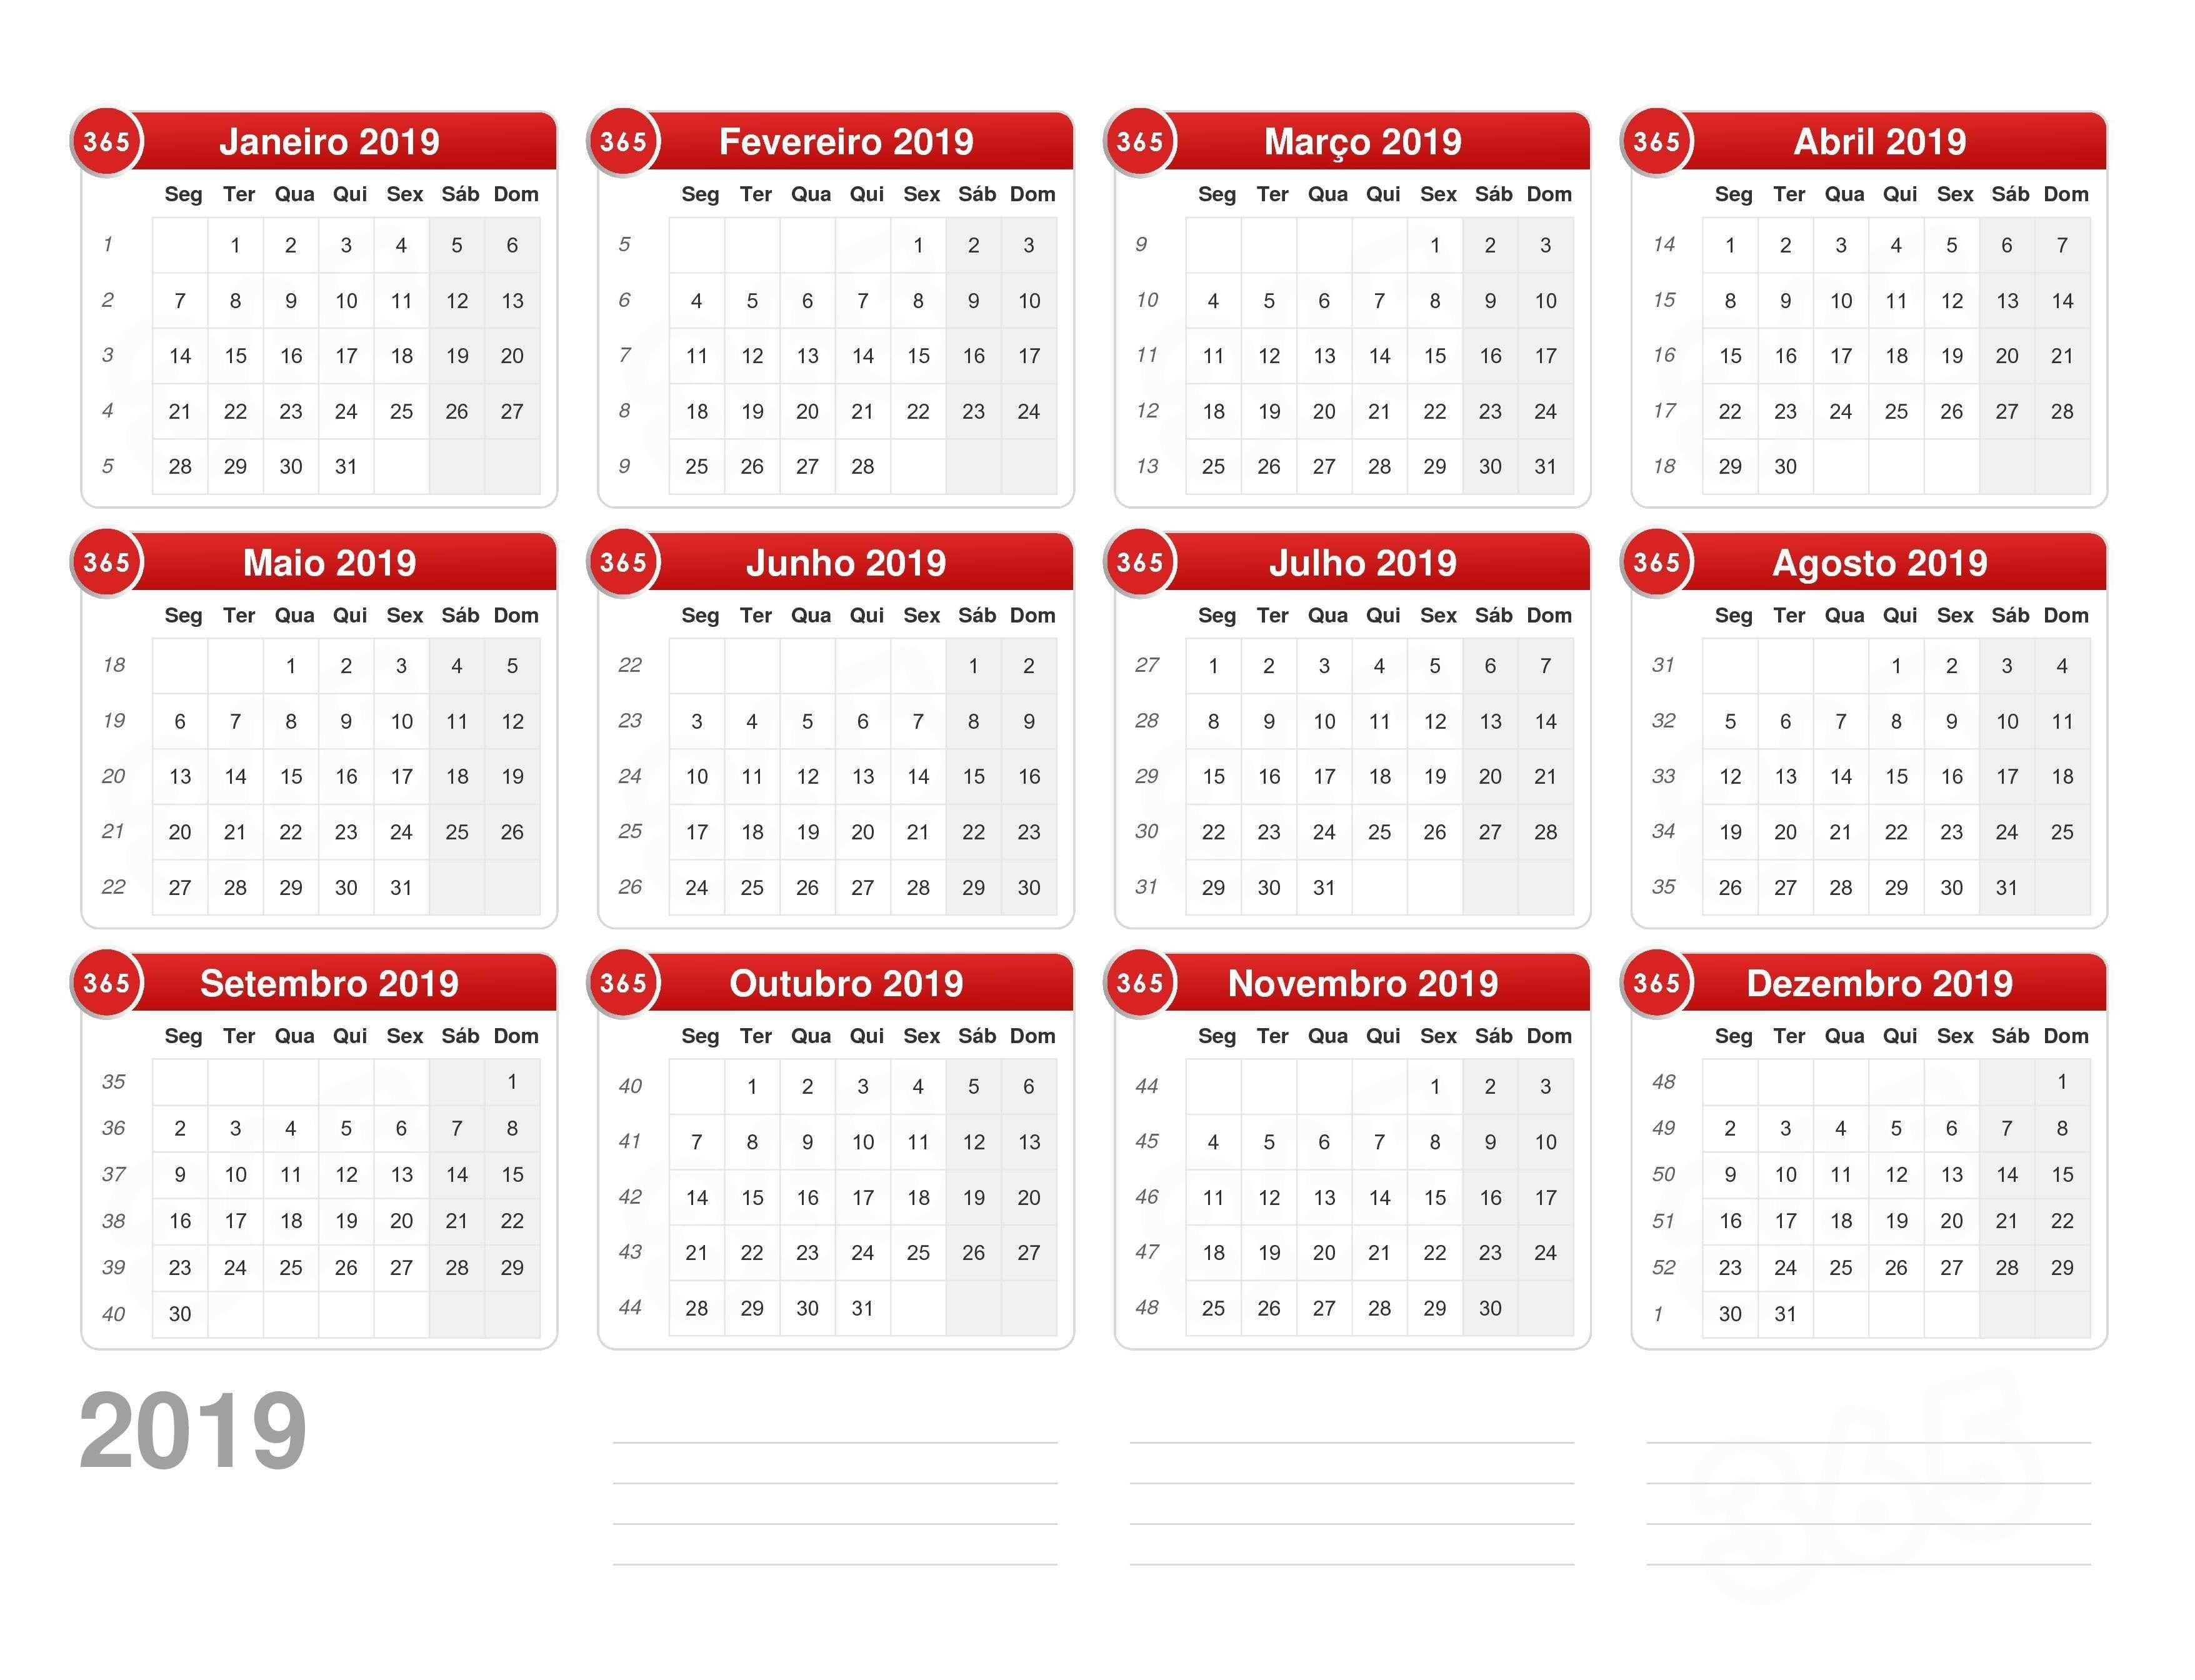 Calendario 2019 Para Imprimir Costa Rica Actual Calendário 2019 Da Stampare Of Calendario 2019 Para Imprimir Costa Rica Más Actual Calendario A±o 2019